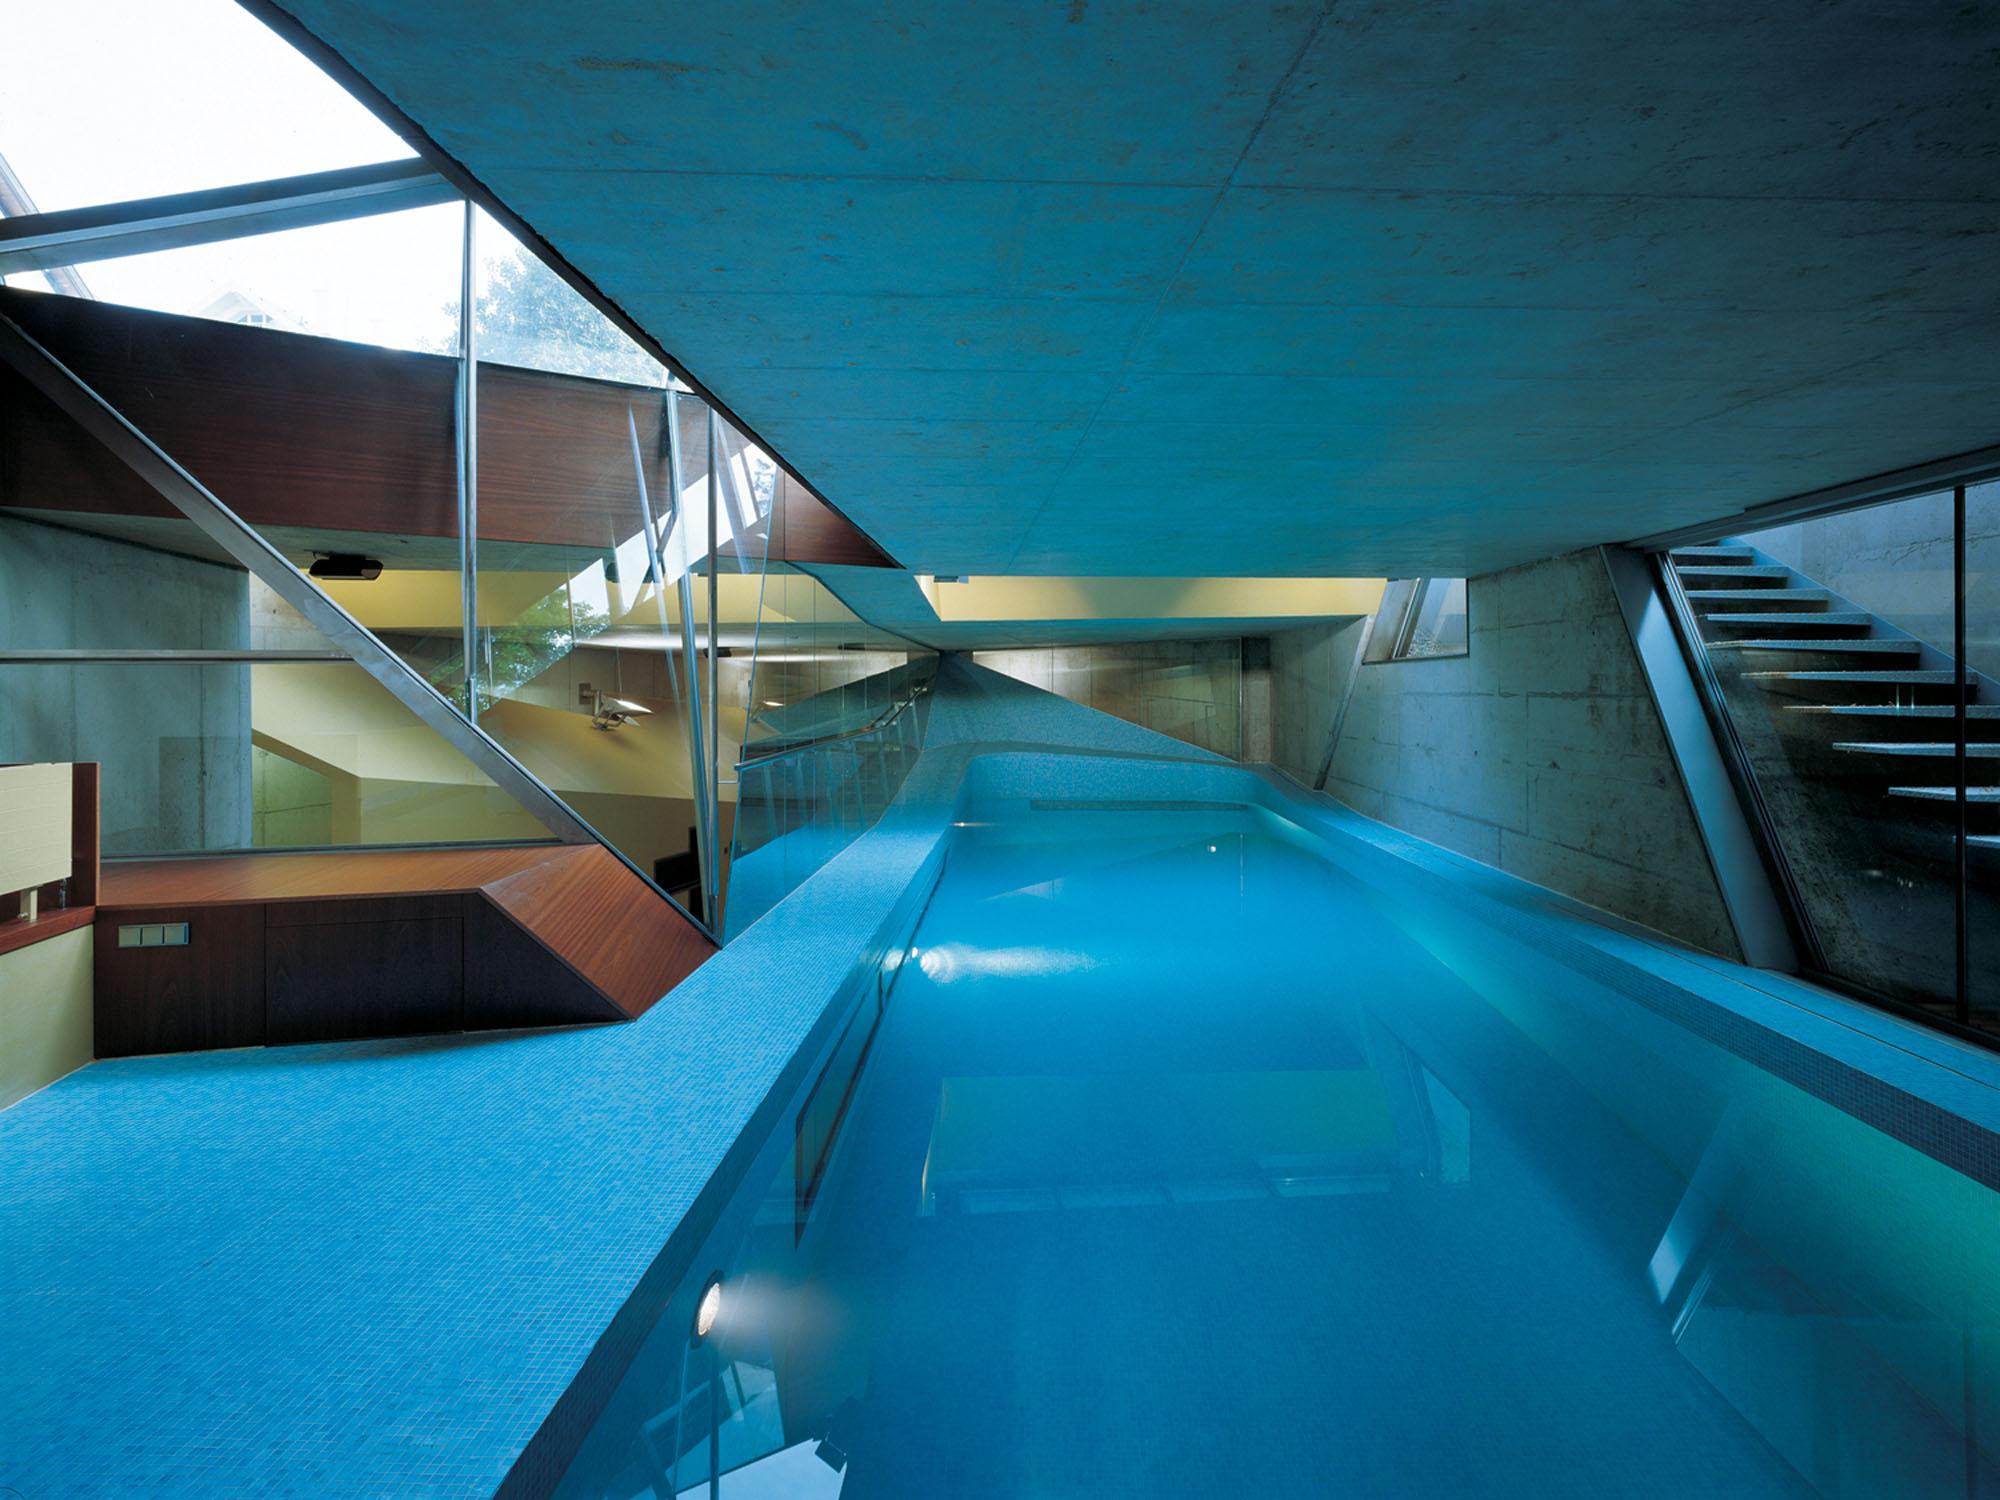 Underground Swimming Pool | the next ENTERprise Architects ...